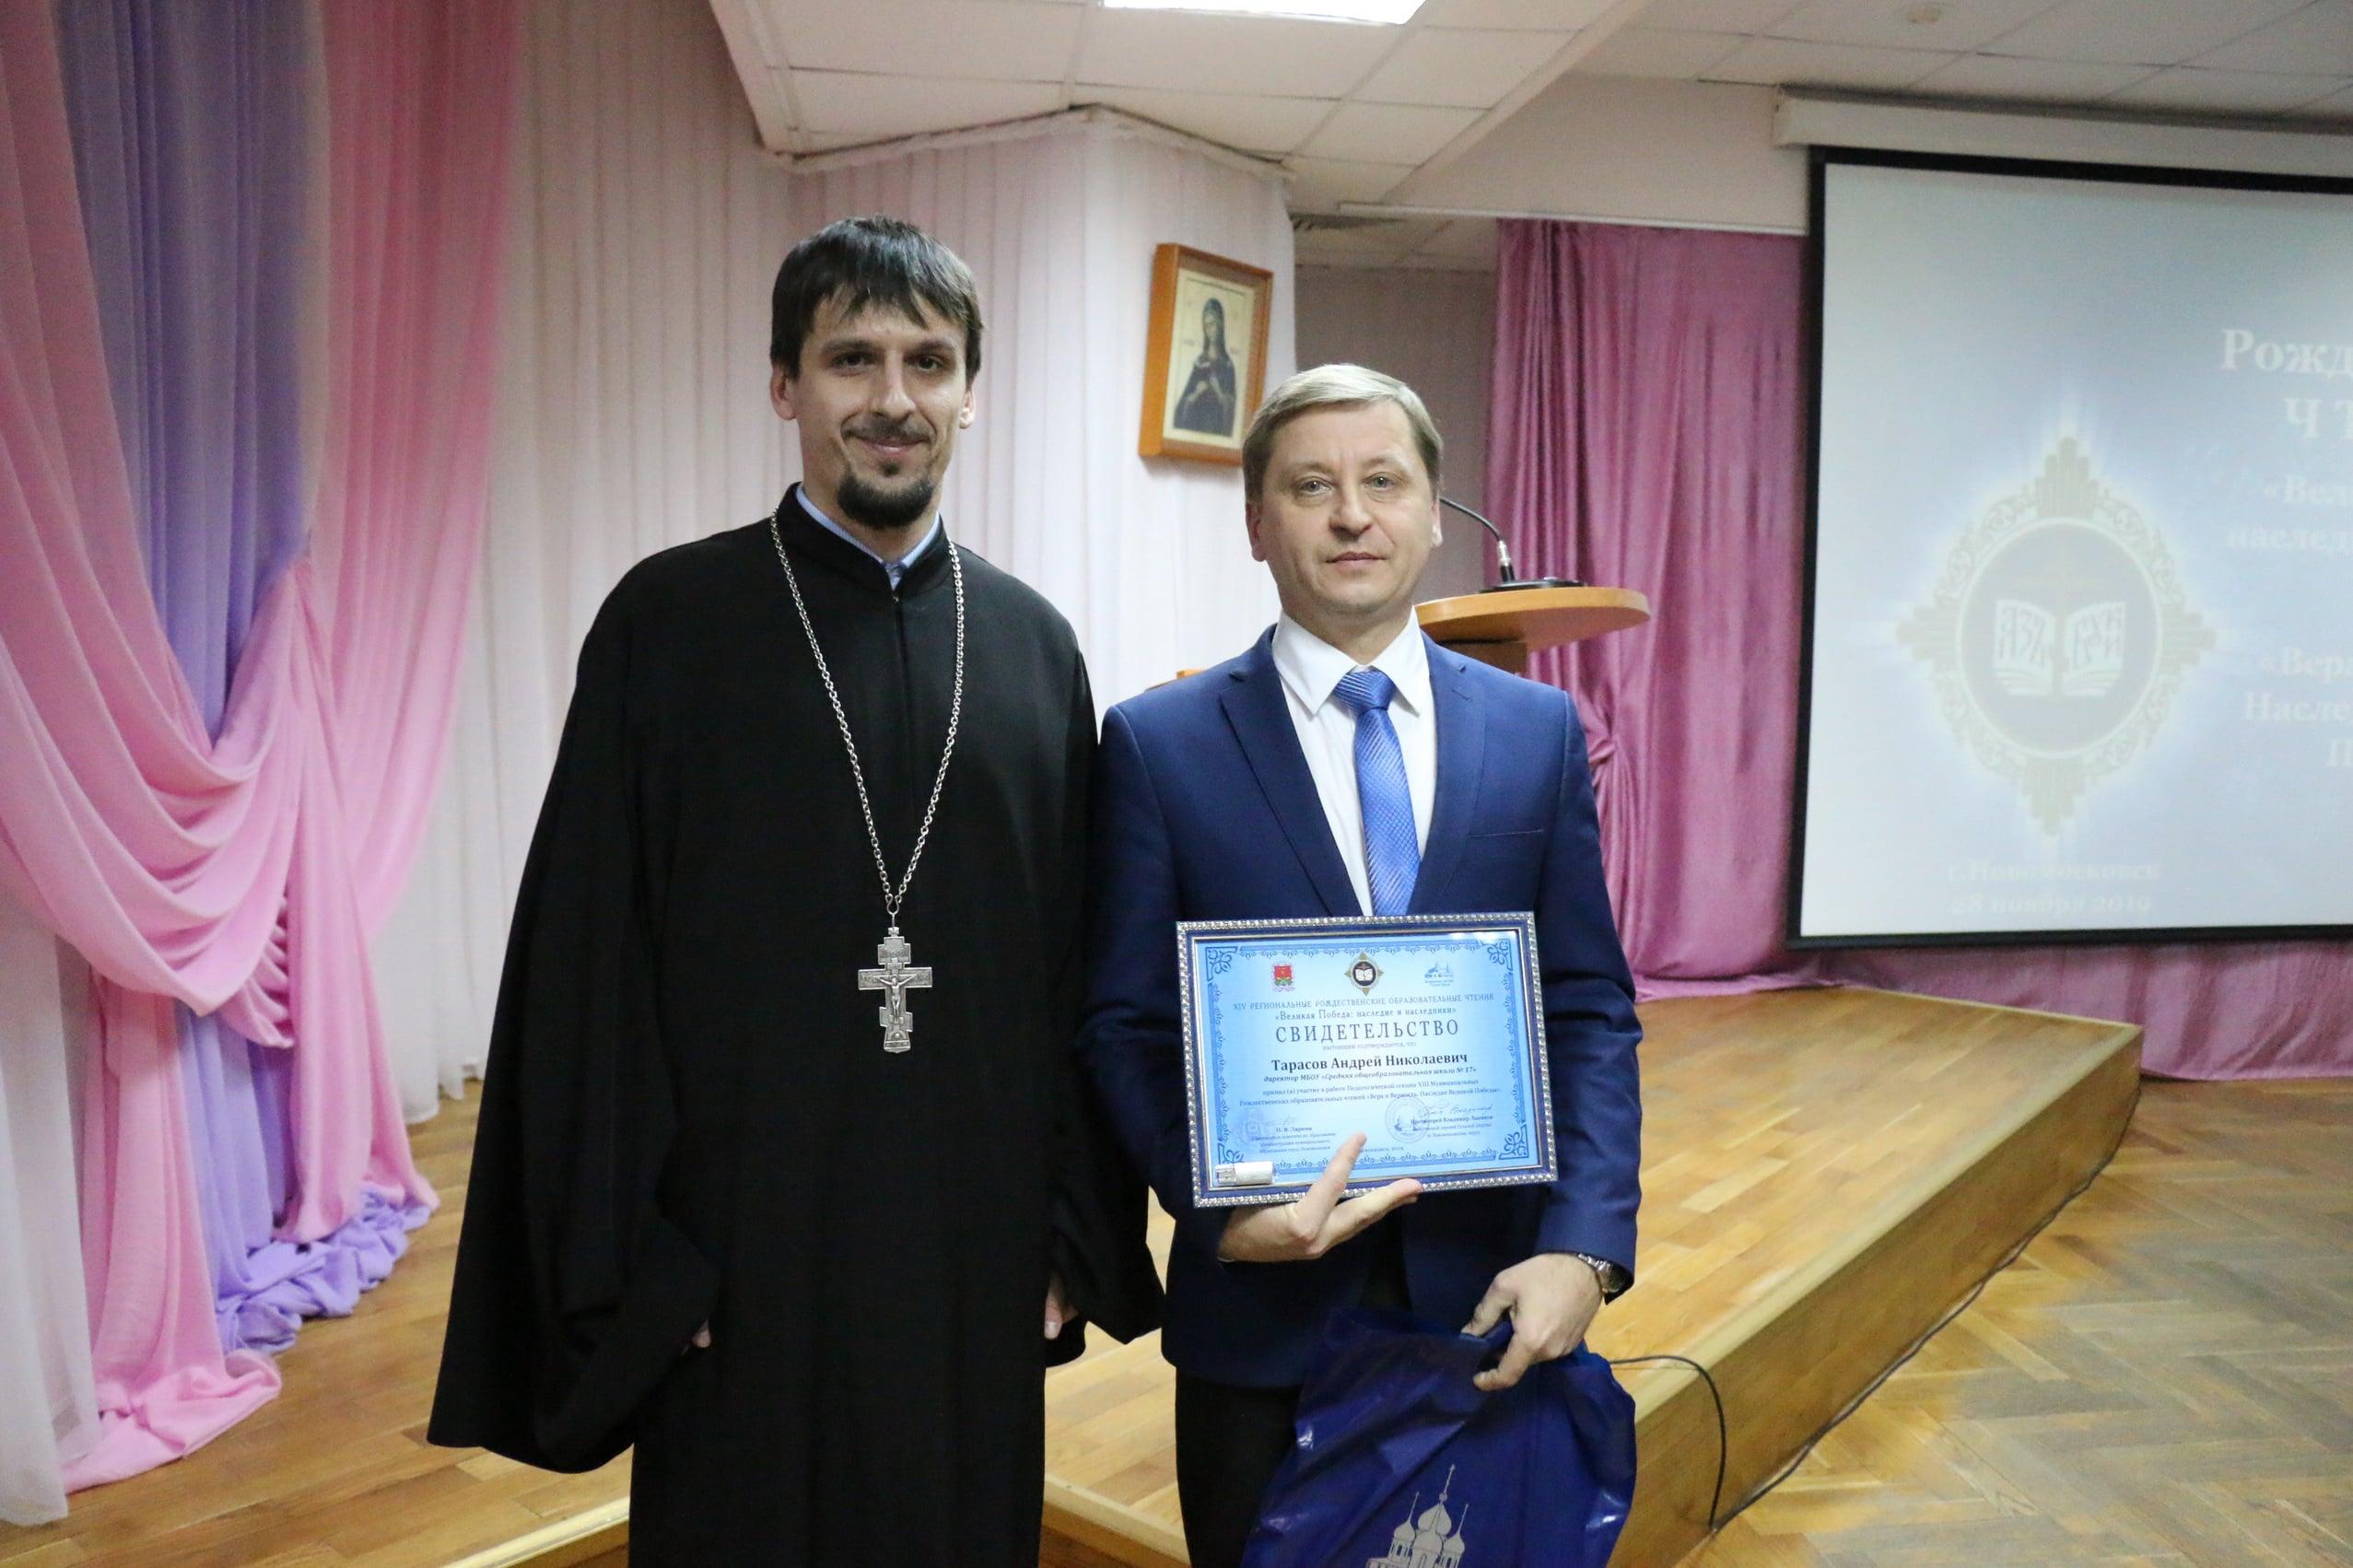 http://monuspen.ru/photoreports/06f1f0951a3799a9c804c7f0881a7692.JPG